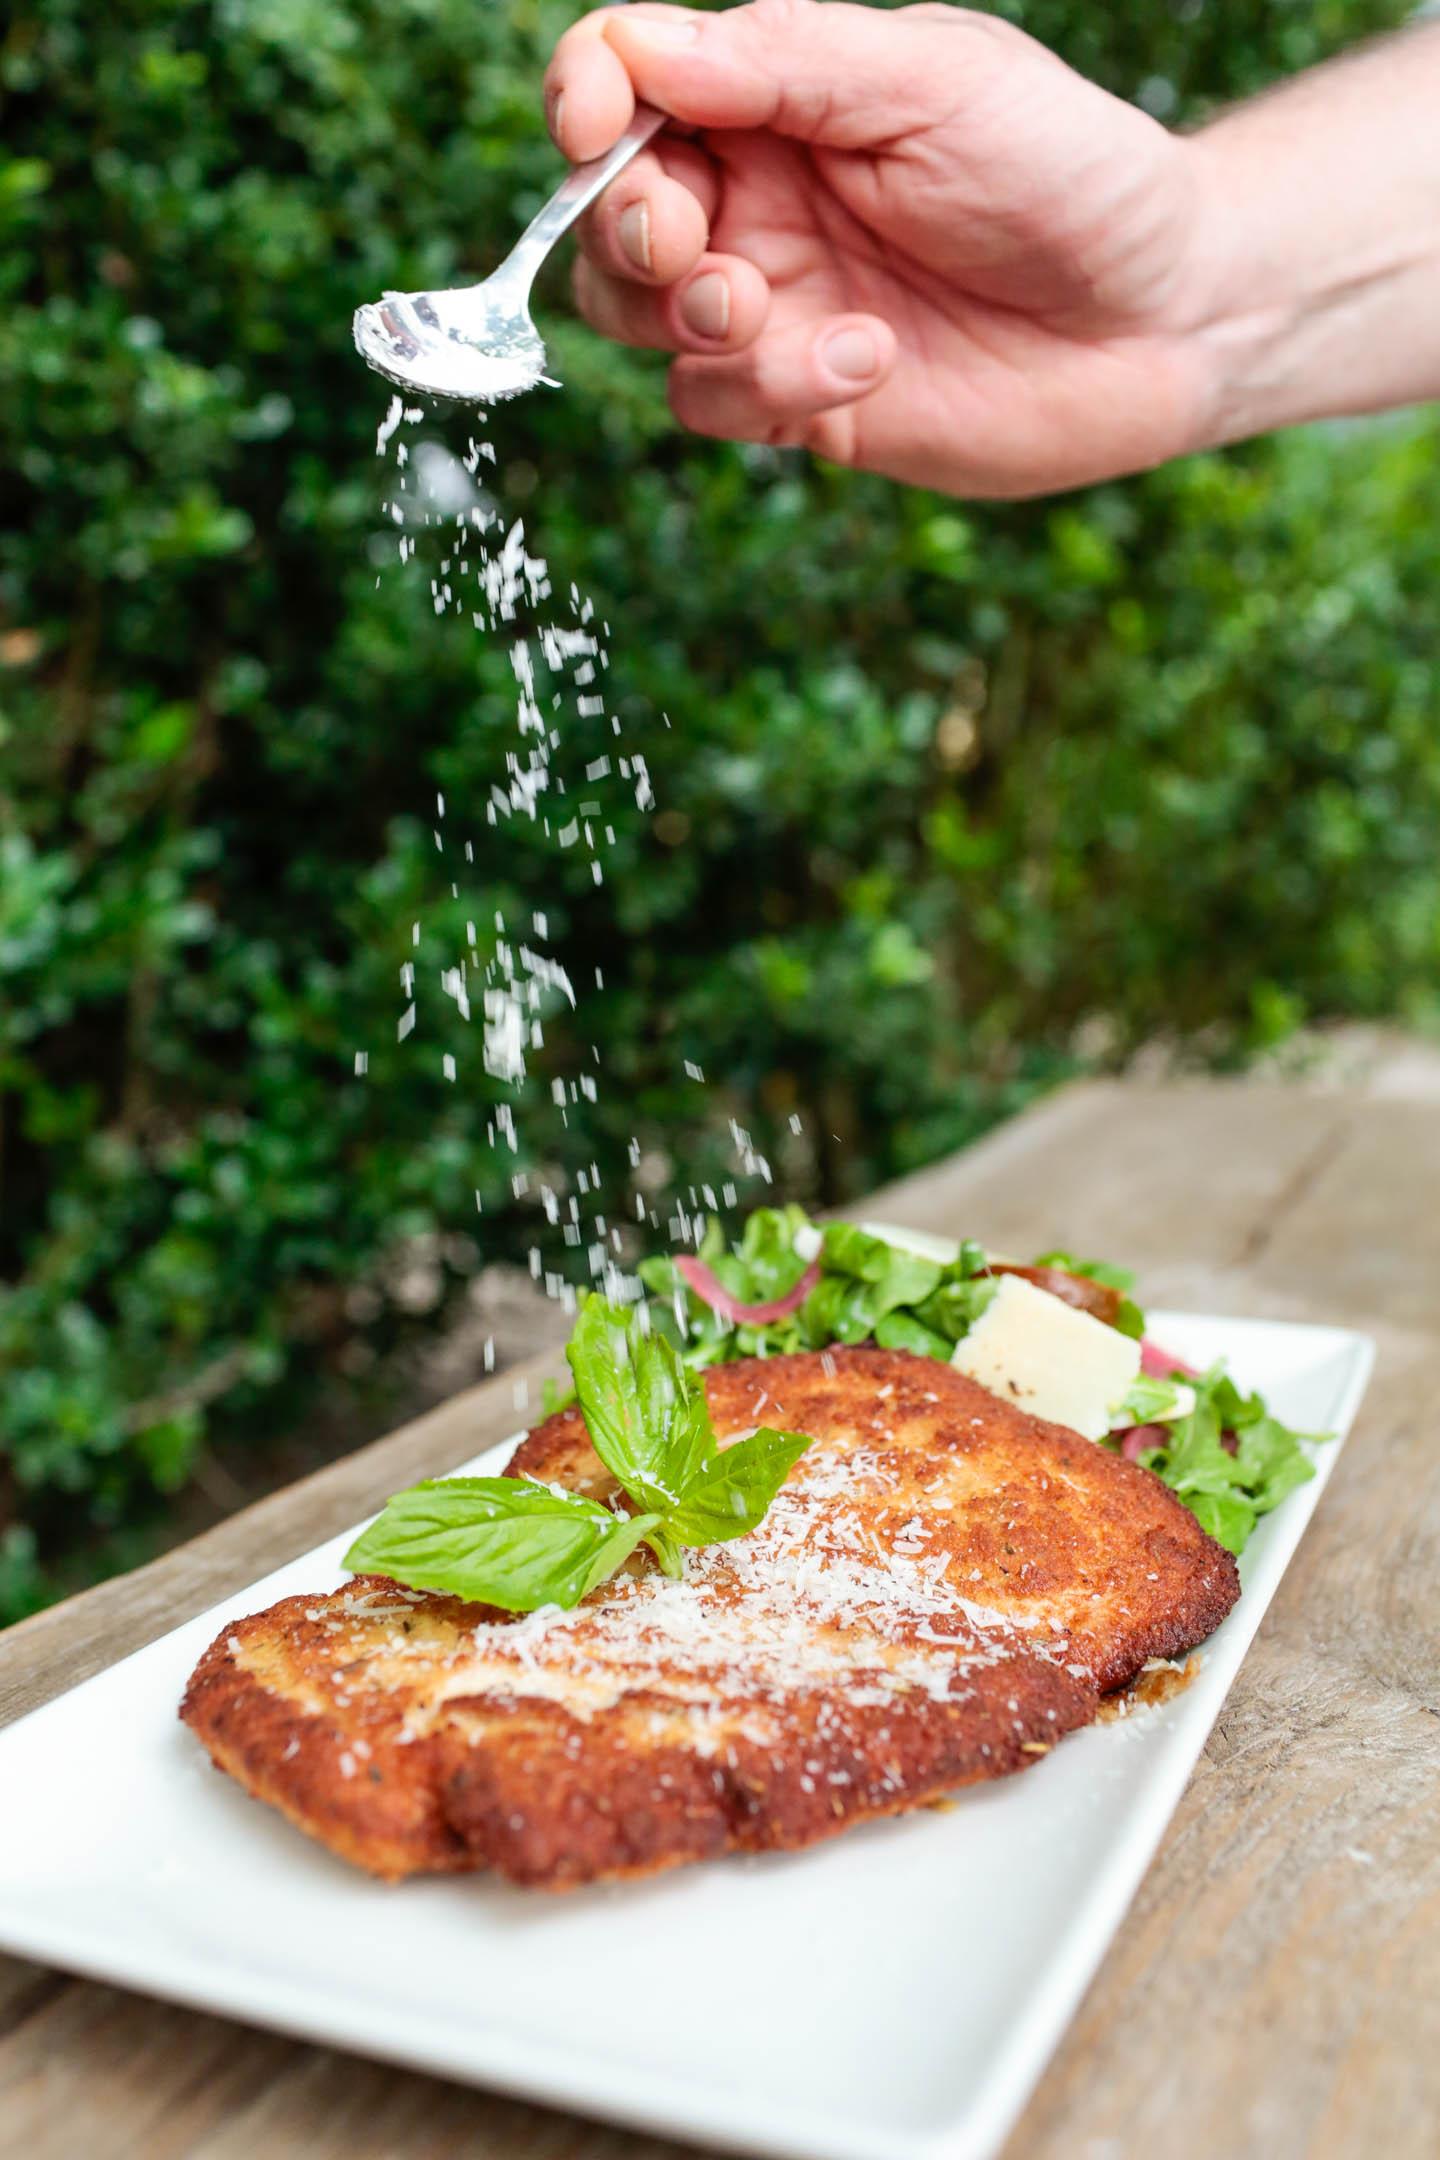 striffler-photography-lifestyle-food-Hamptons-25.jpg